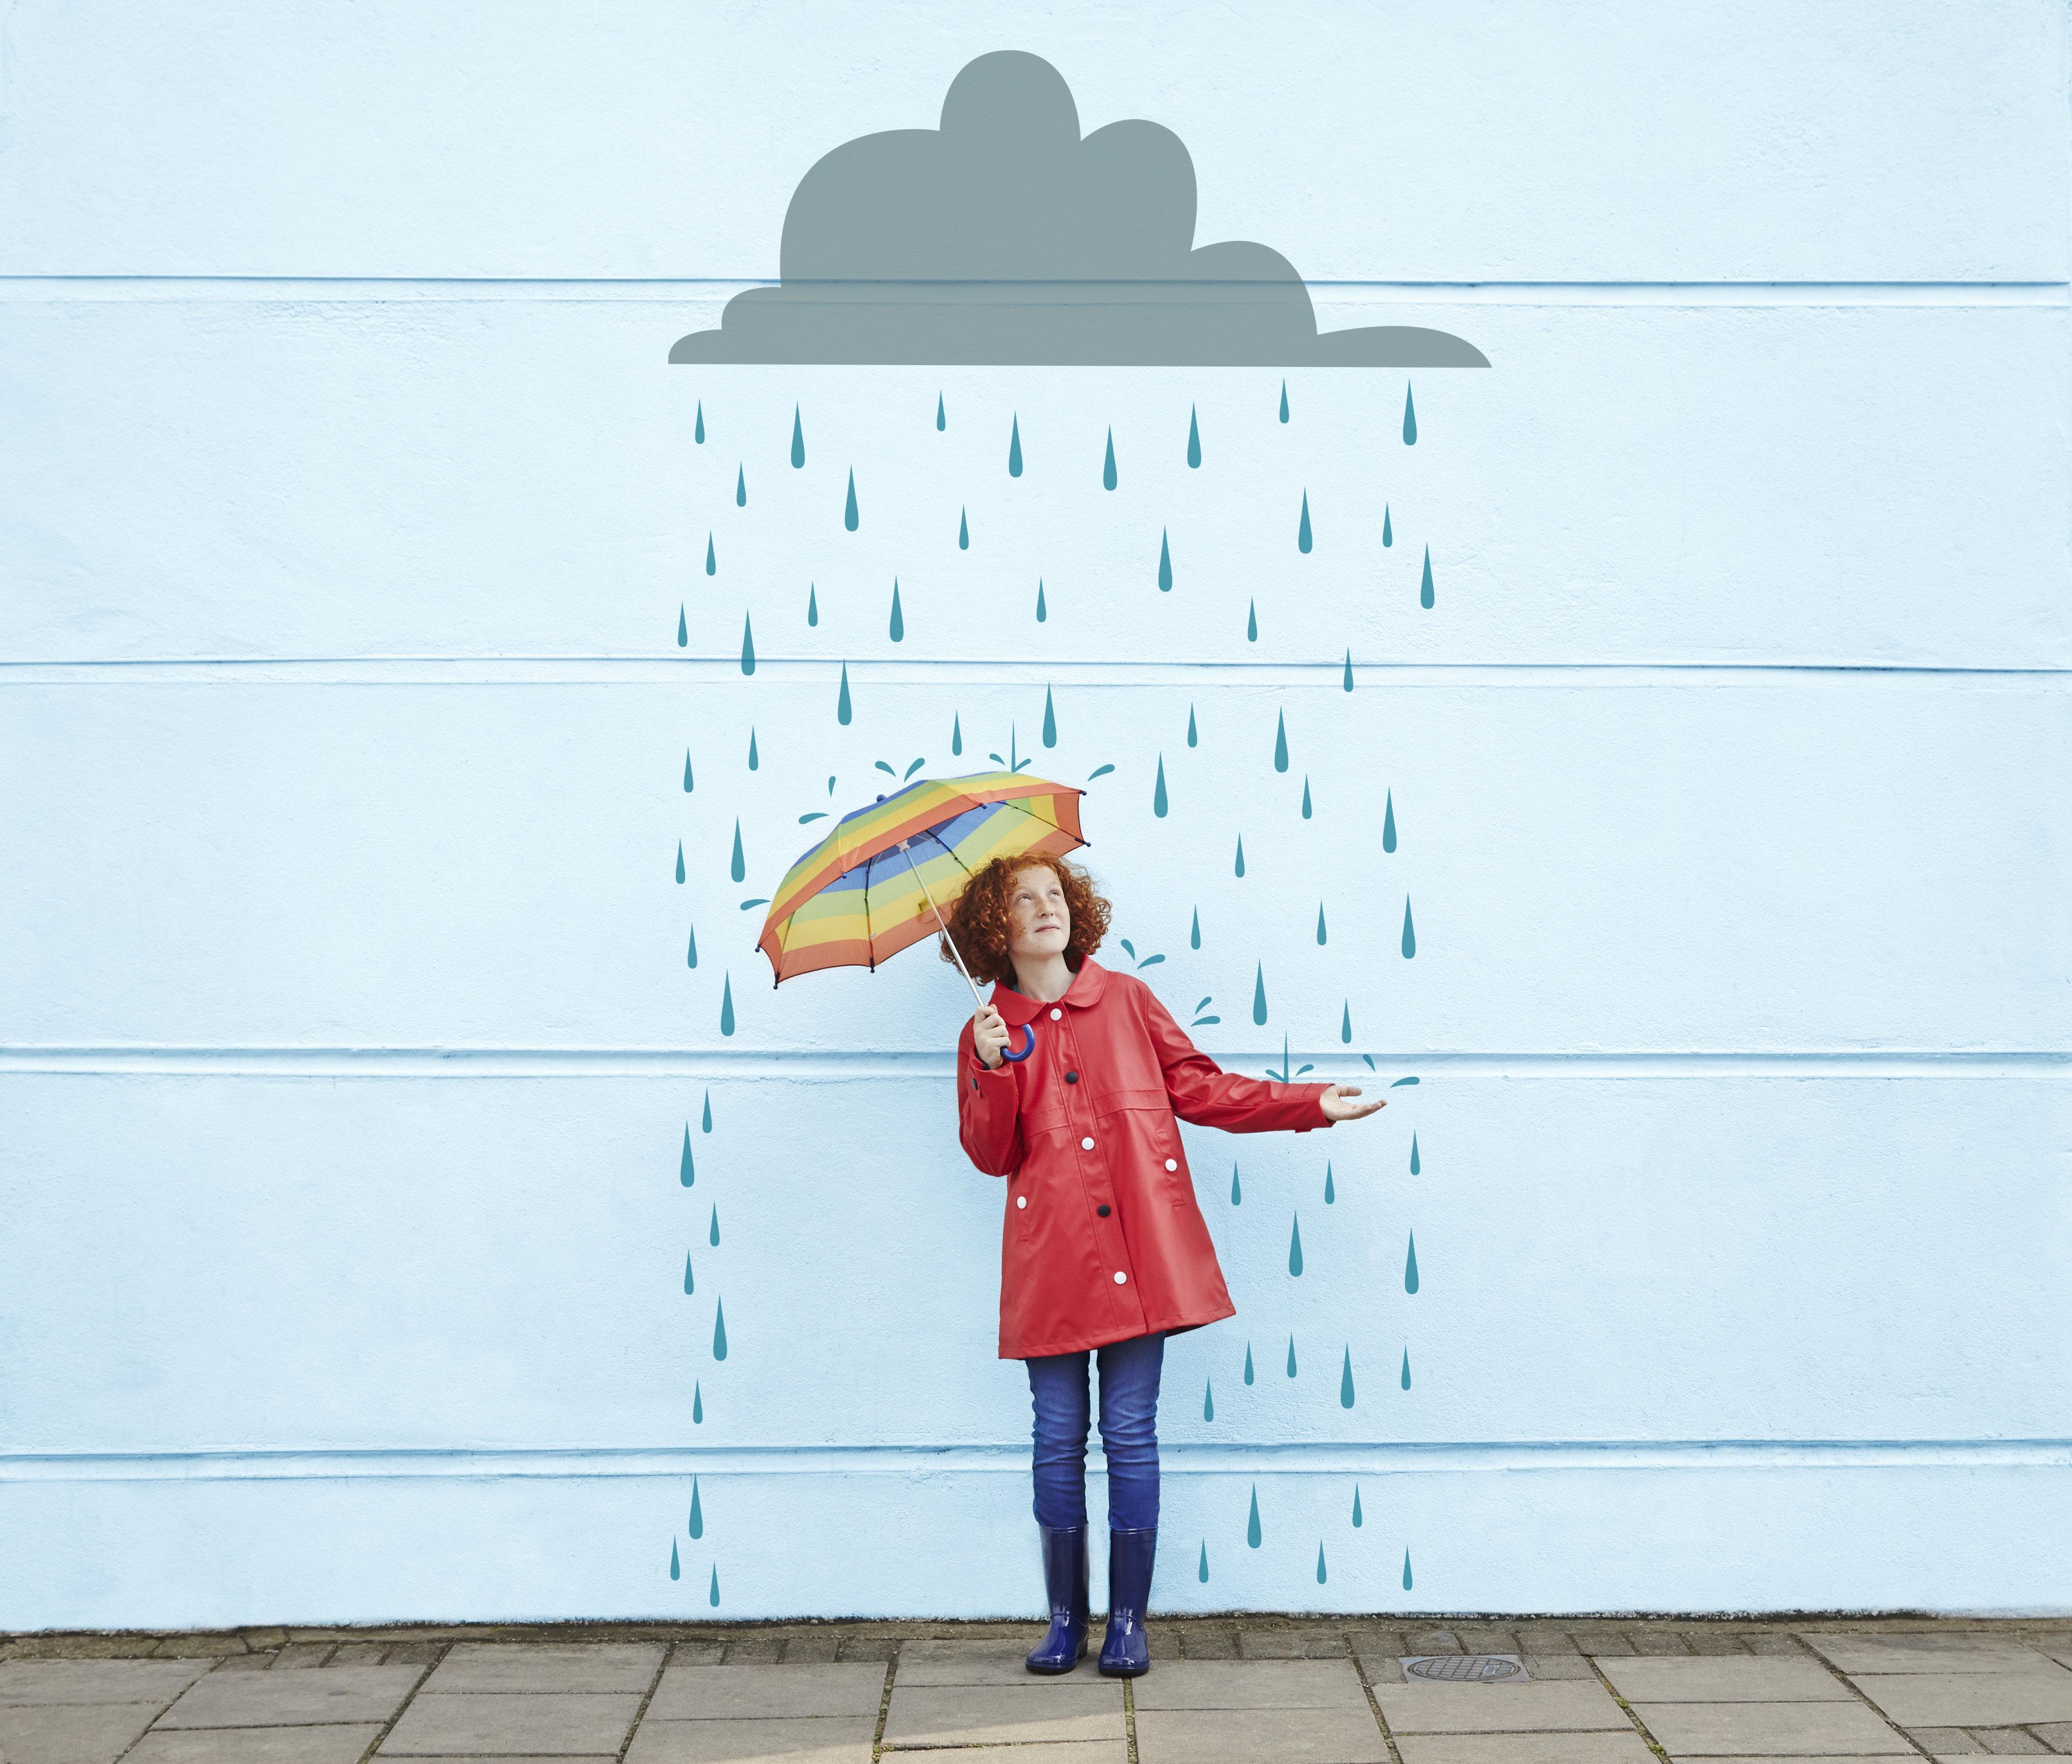 Girl holding umbrella with cartoon rain cloud